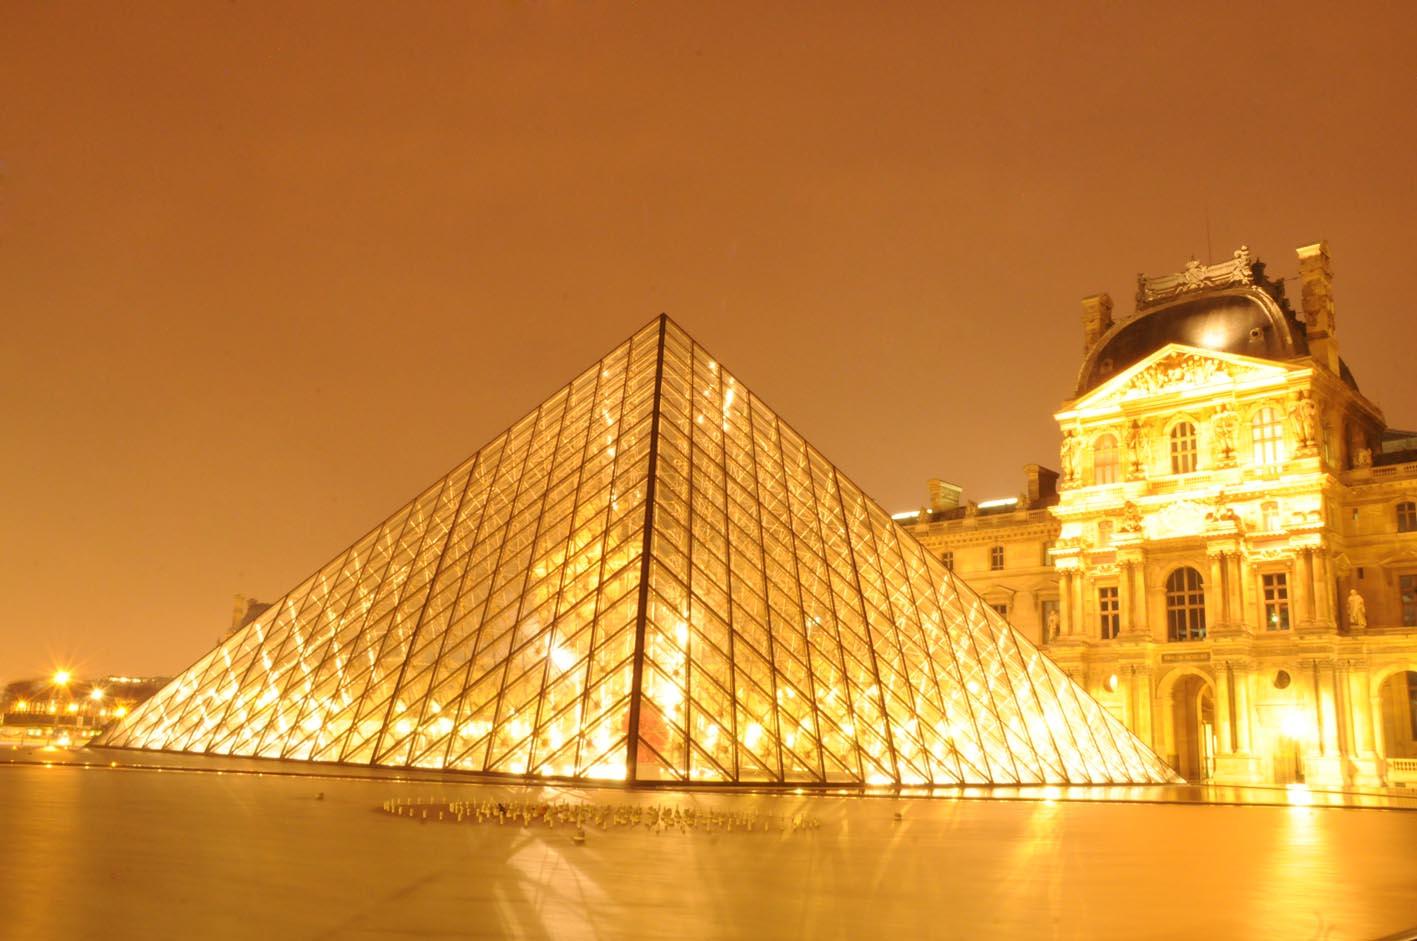 Museu do Louvre Louvre%2B-%2BFoto%2BR%25C3%25B4mulo%2BSeitenfus